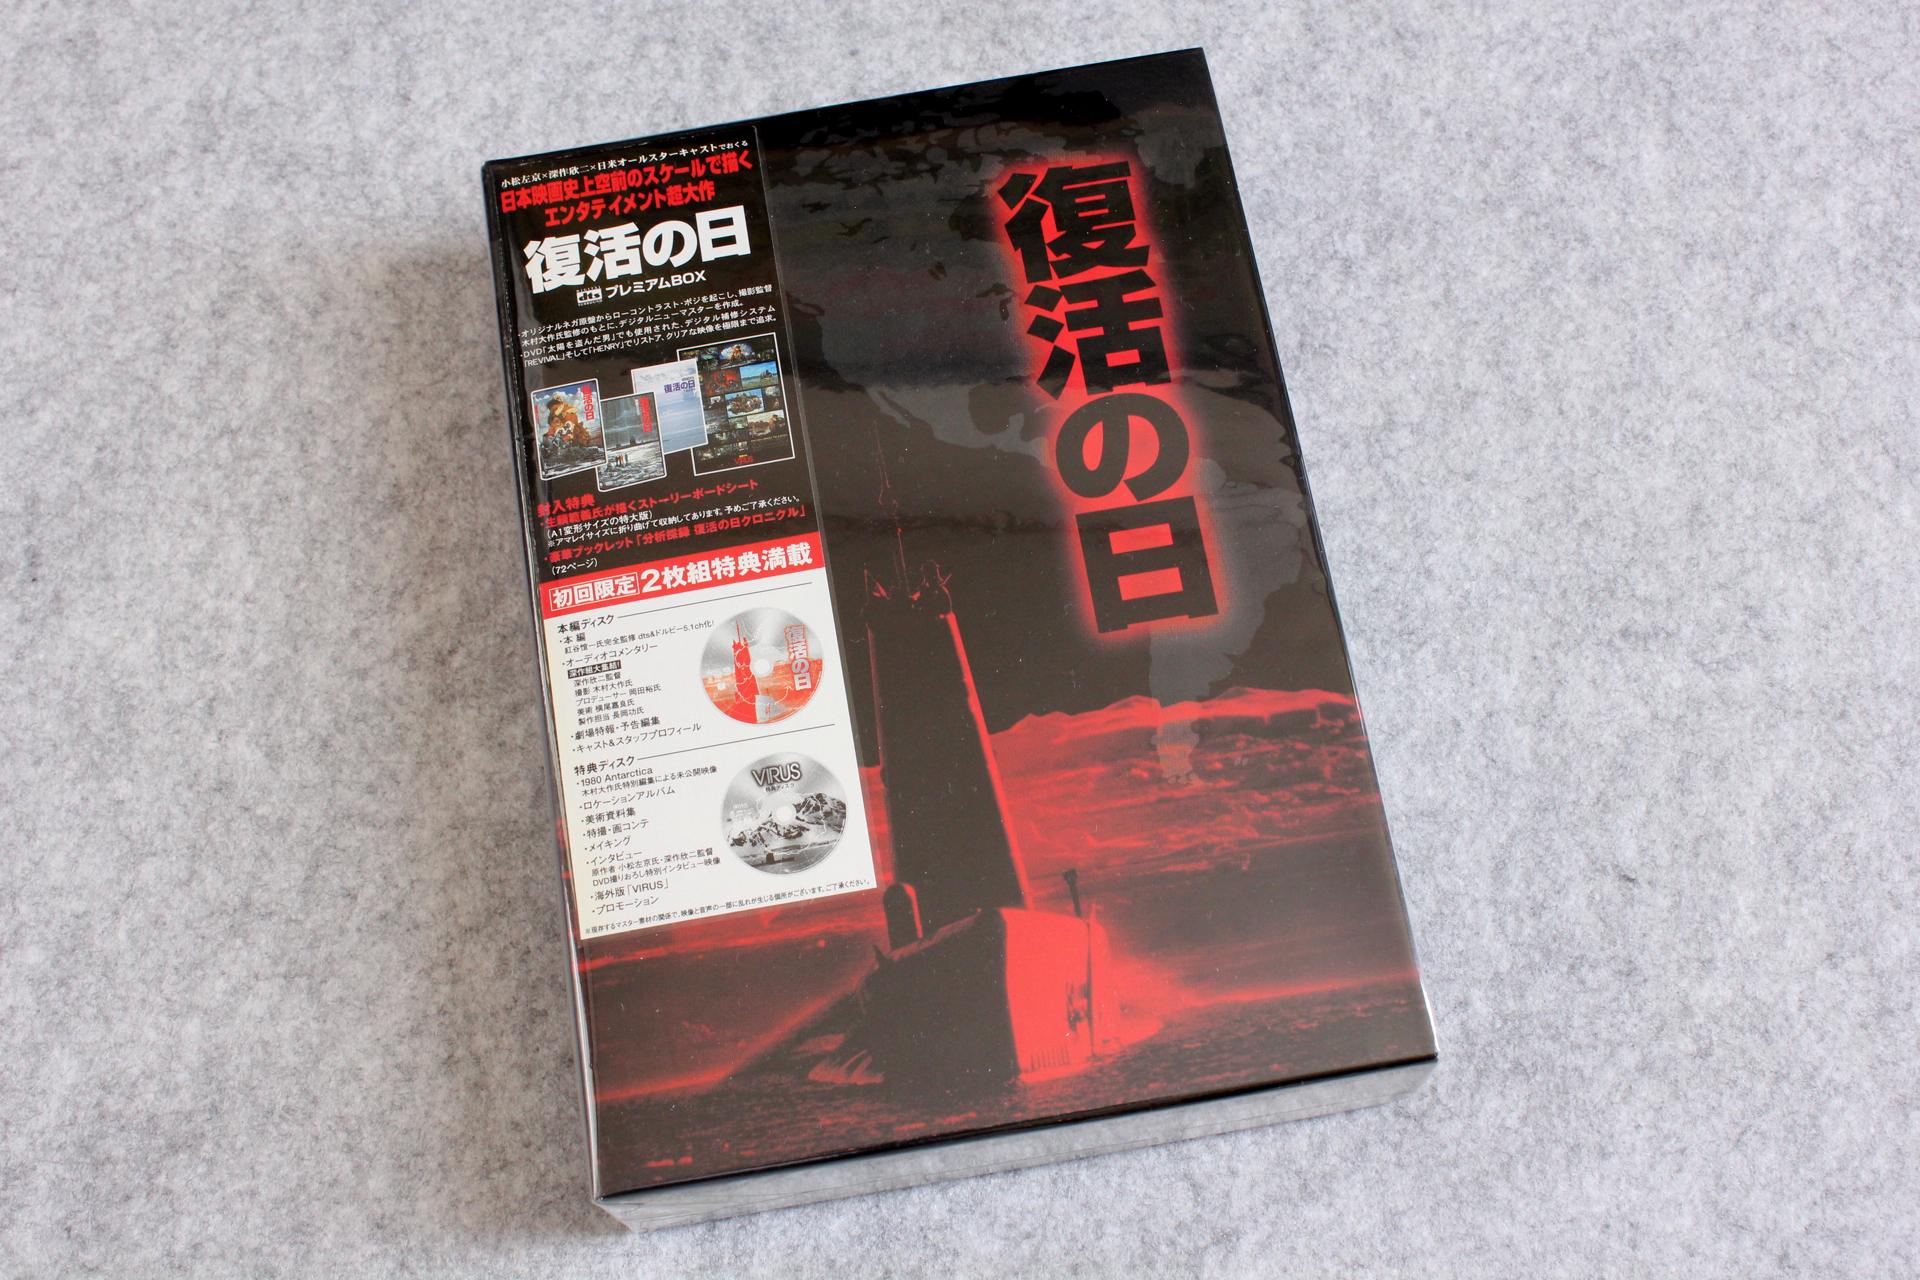 2019-05-25-FUKKATSU_NO_HI-UHDBD-4.jpg